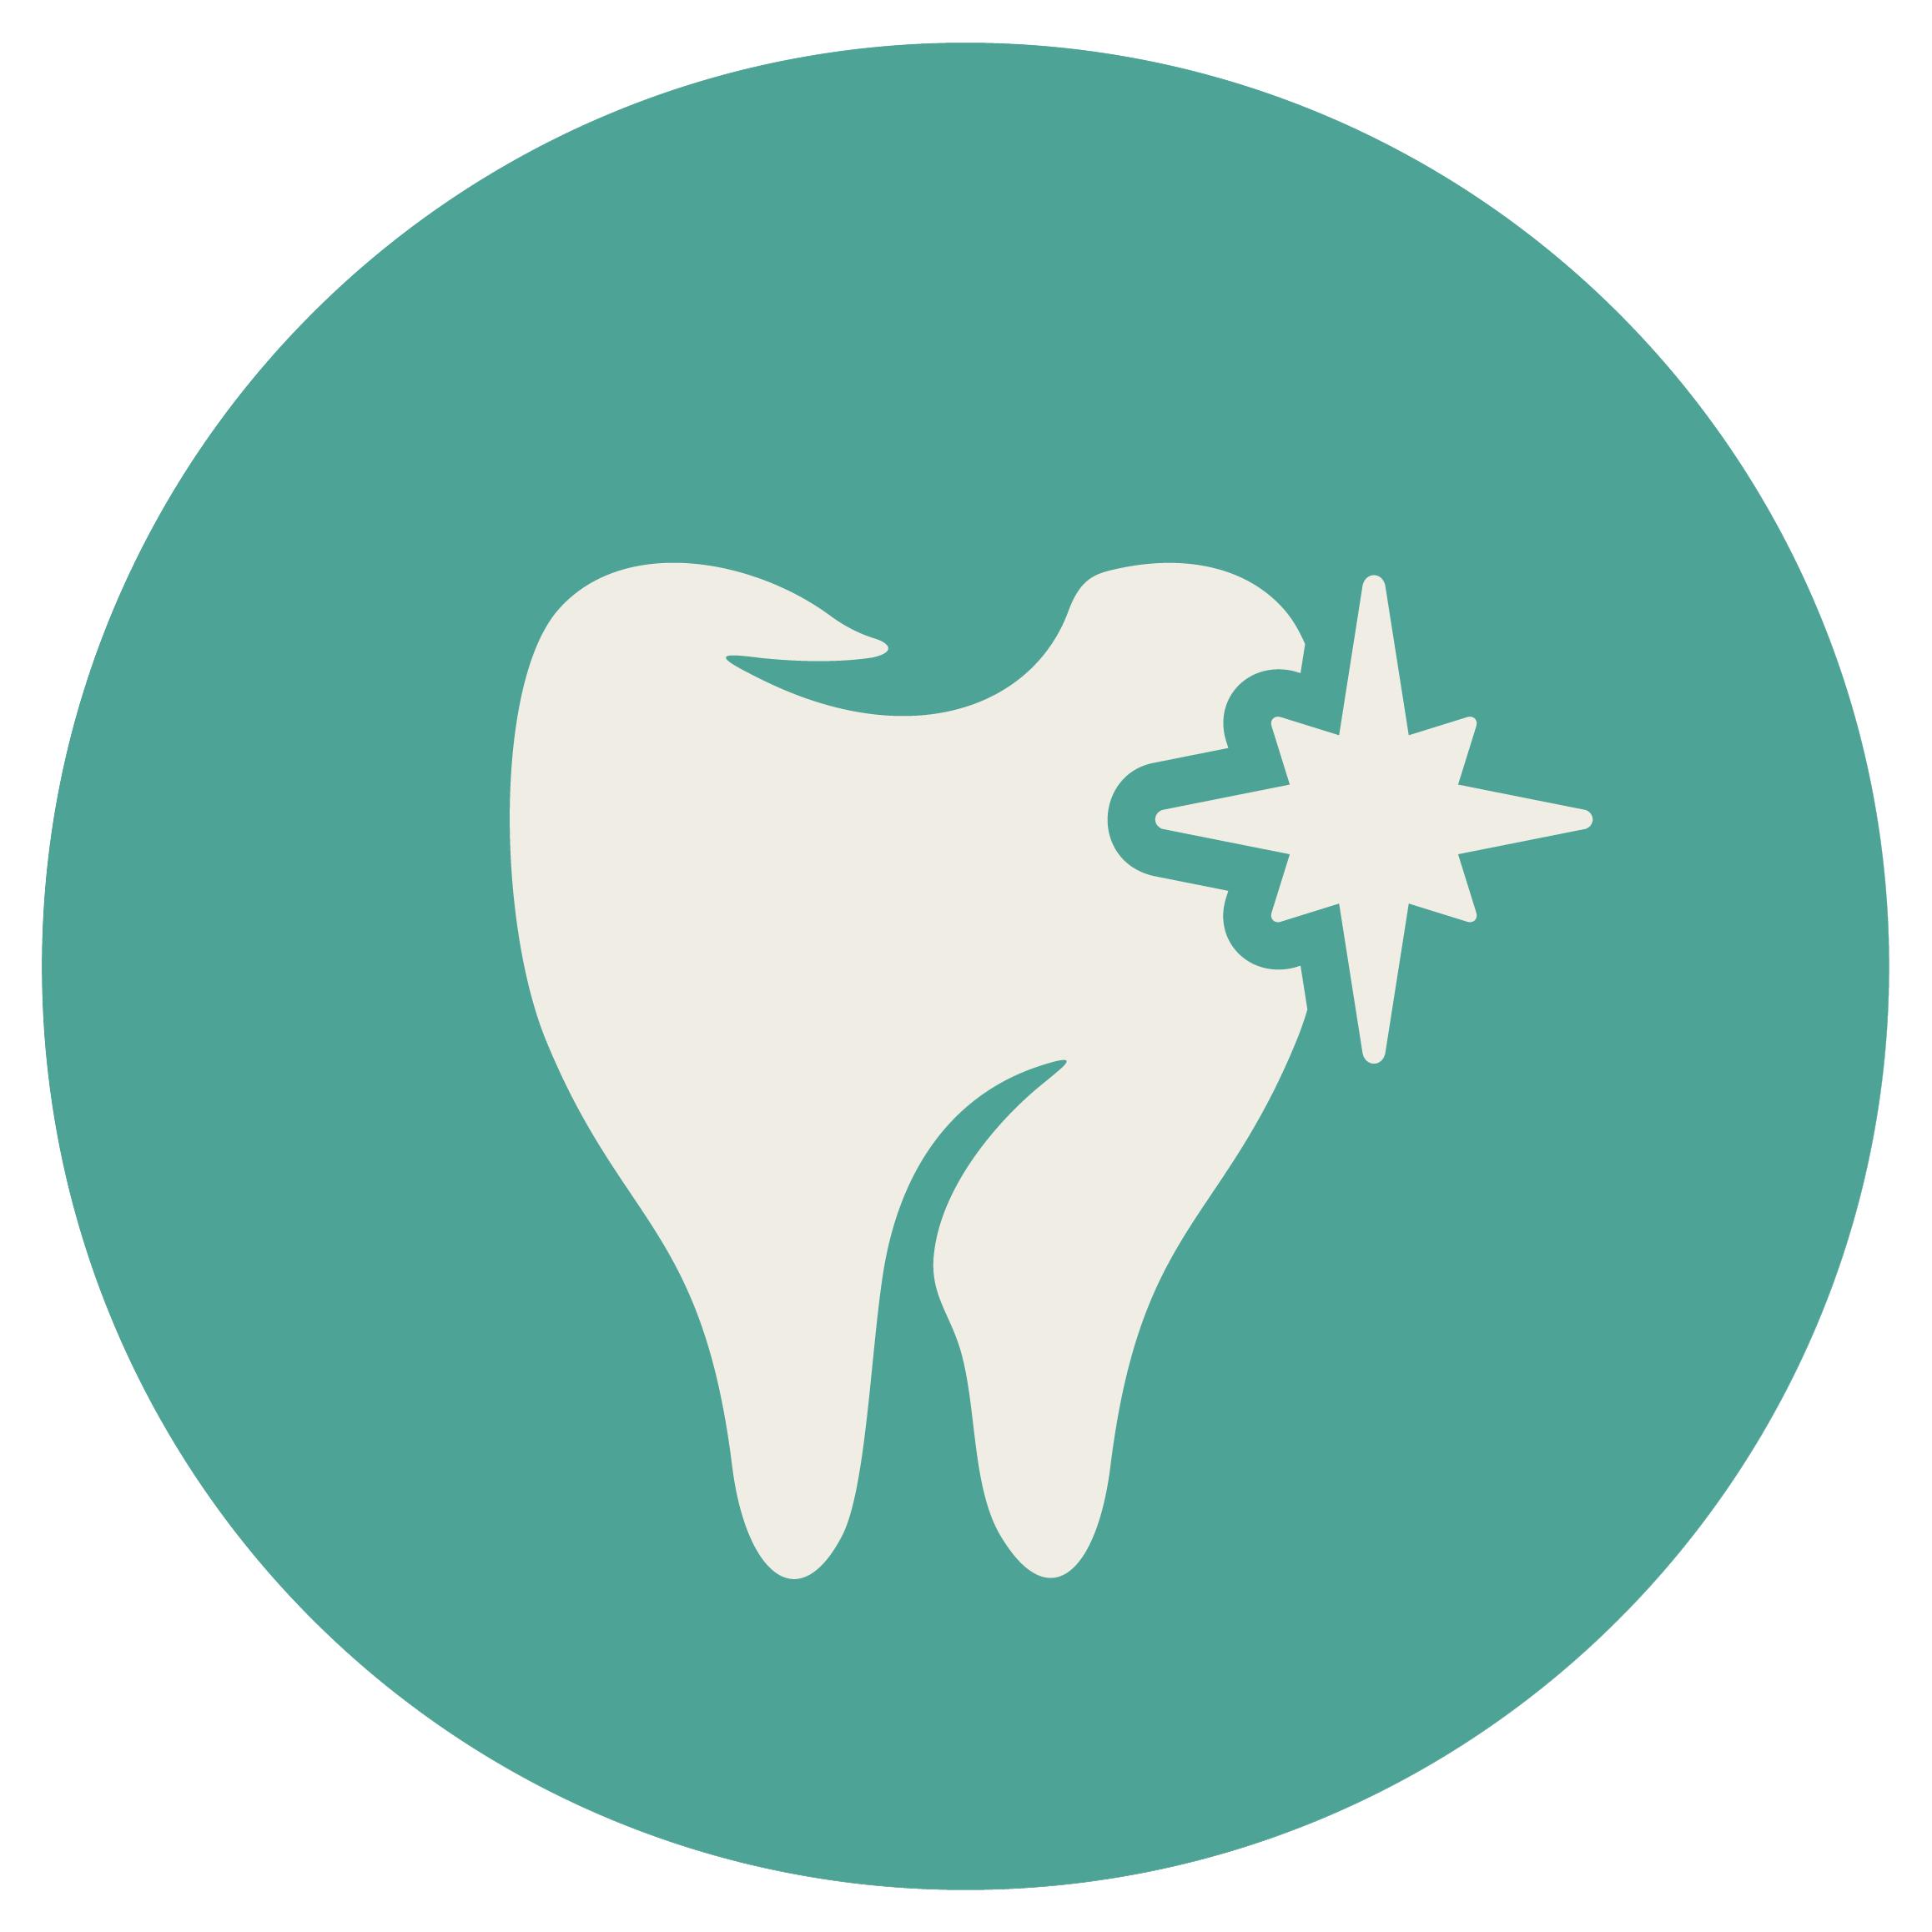 cometic-dentistry-crestwood-dental-clarkston-michigan-dentist-friendly-h